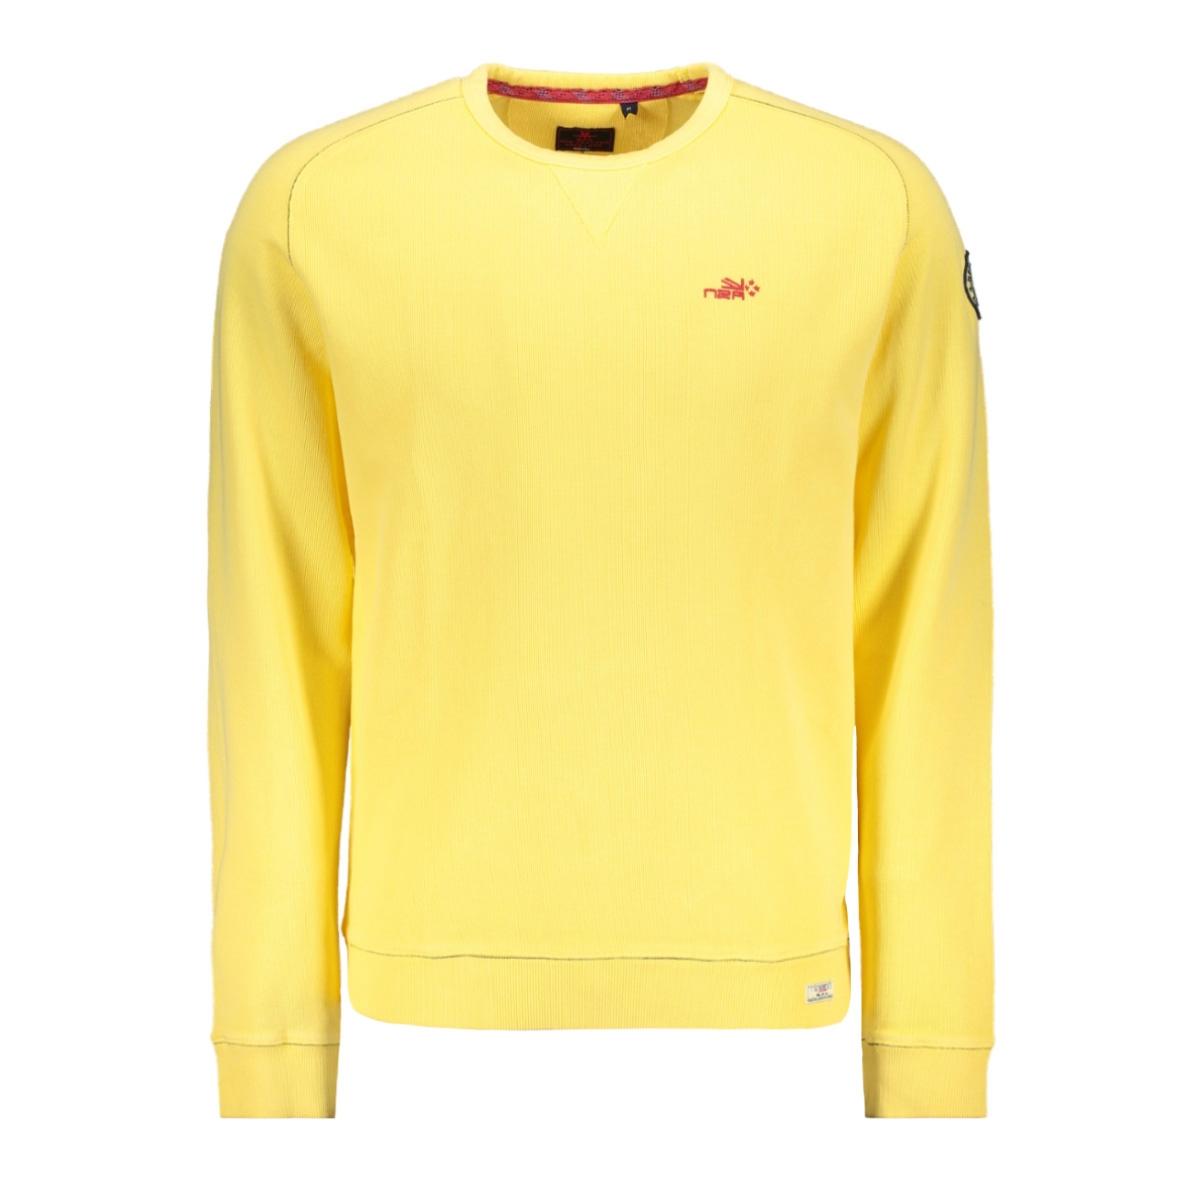 pararoa 20bn308 nza trui 452 soft yellow